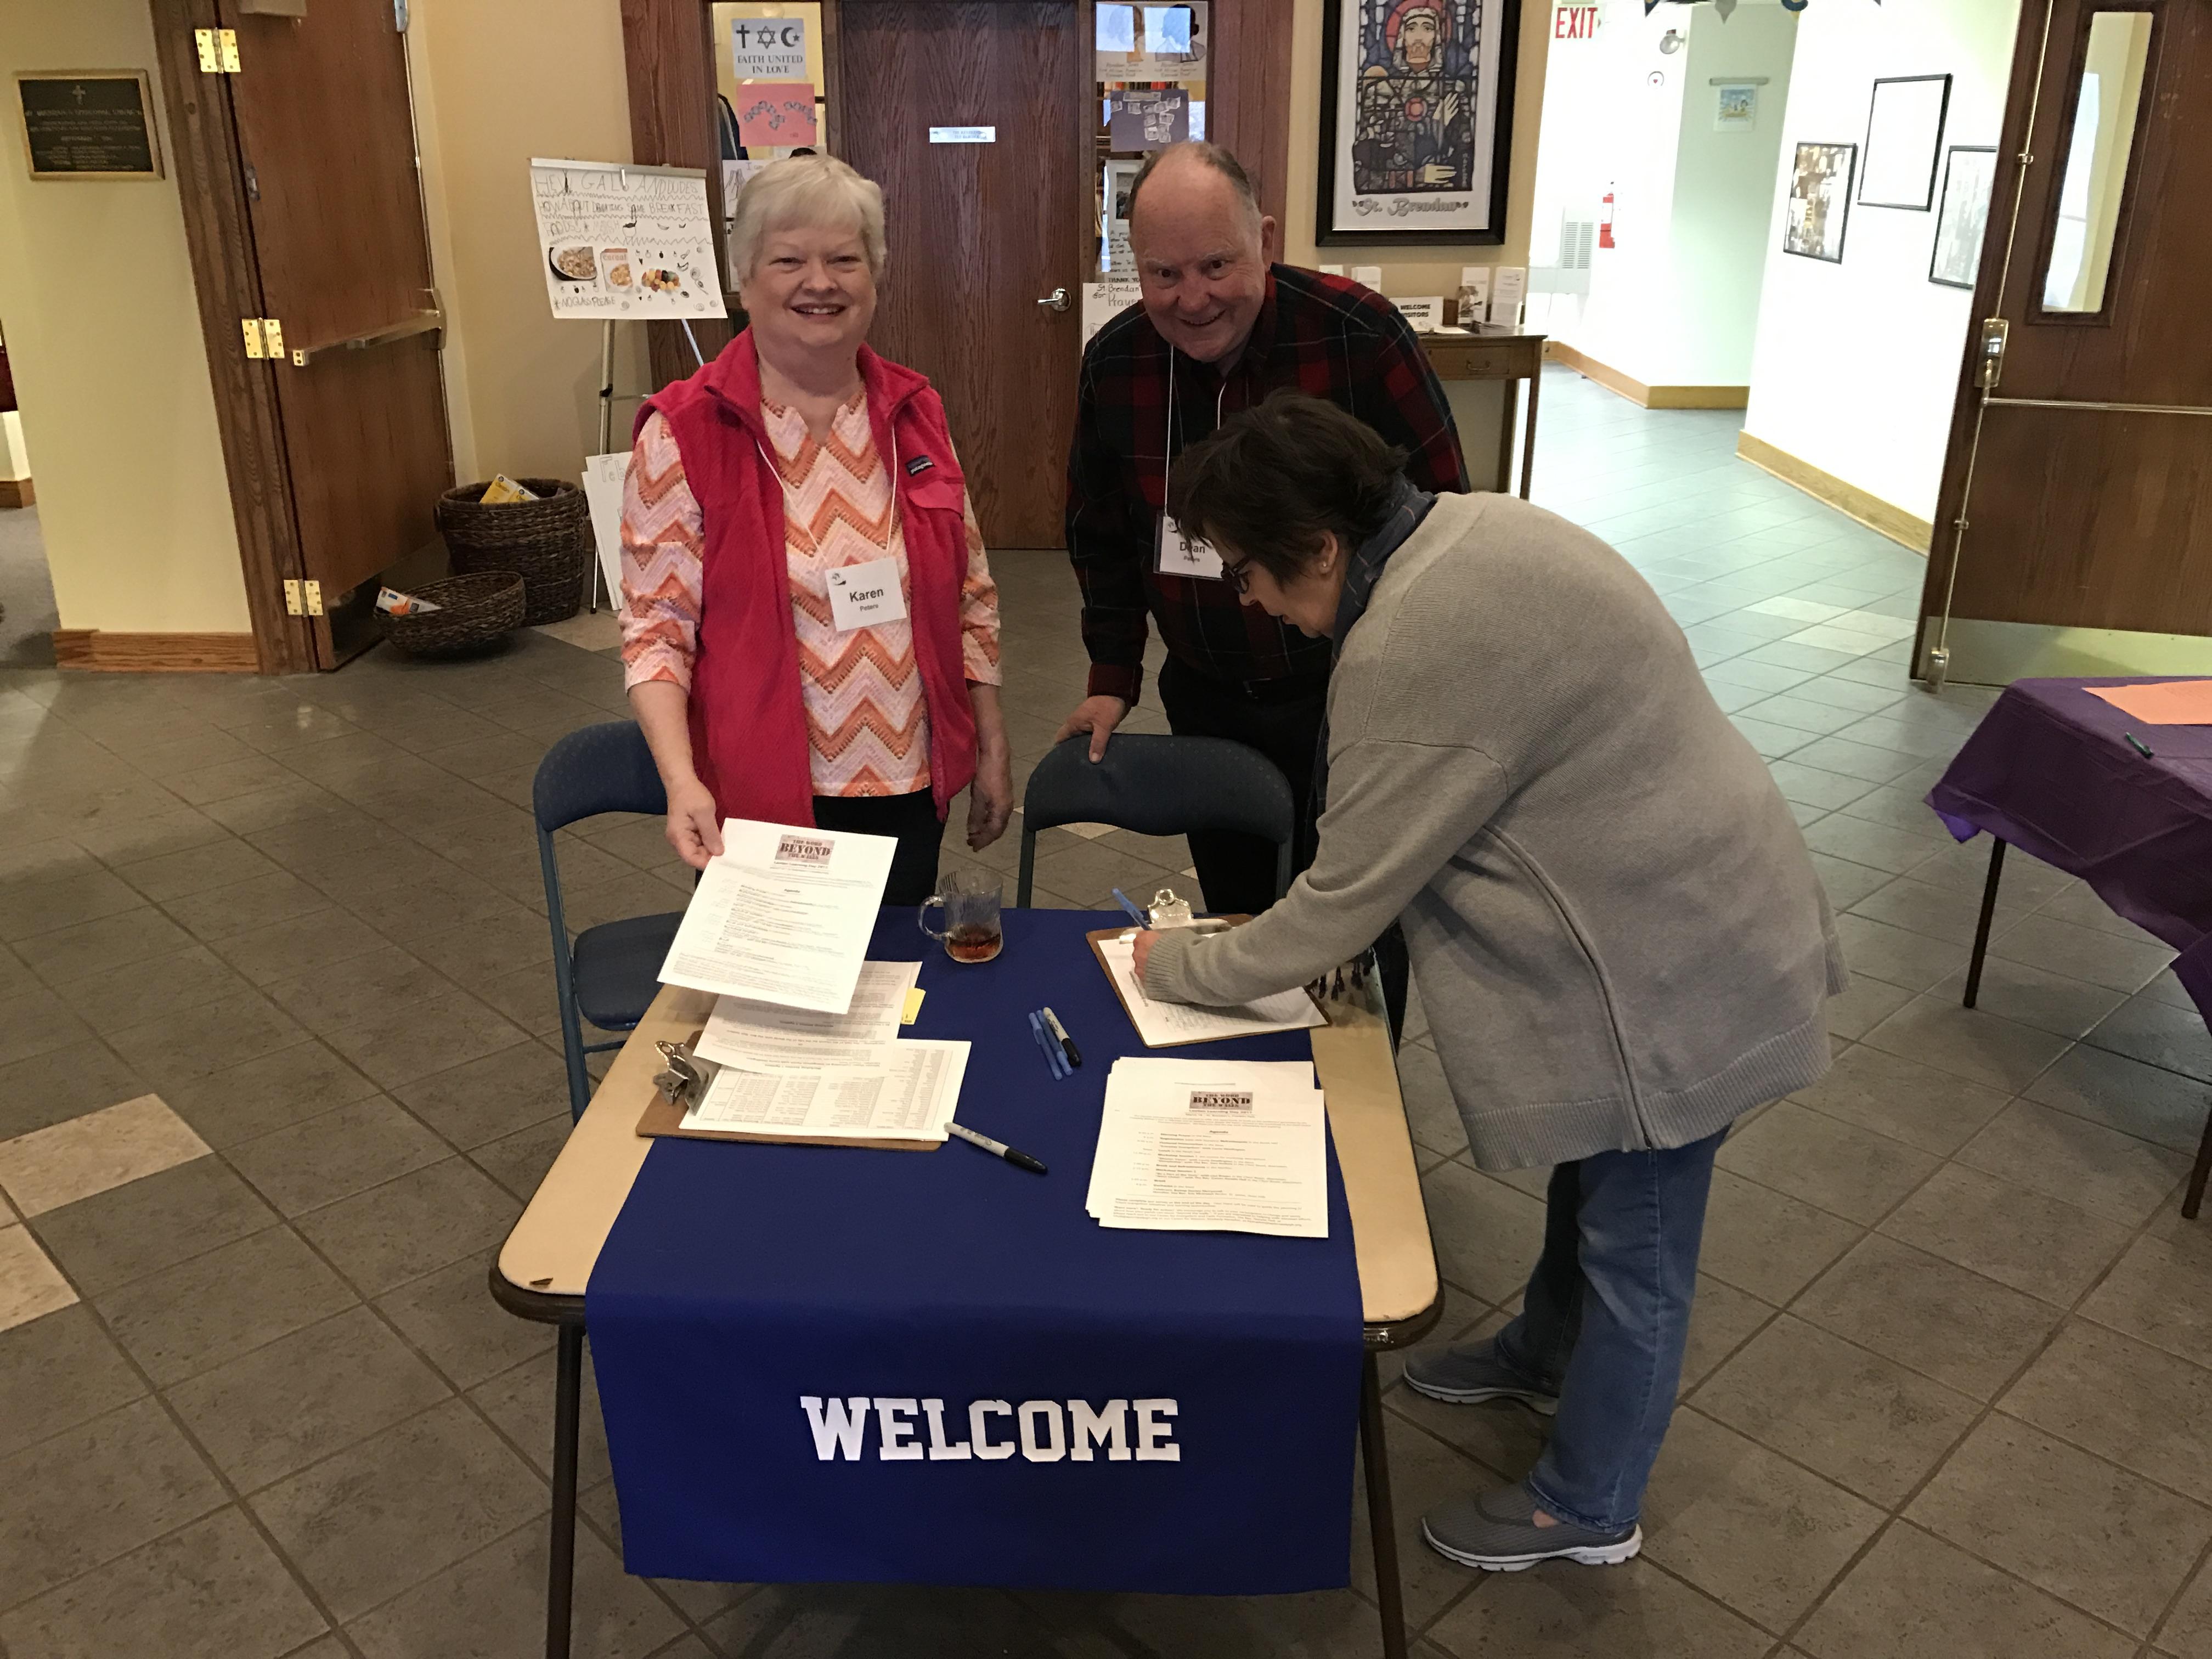 Evangelism Conf 2017 - Welcome